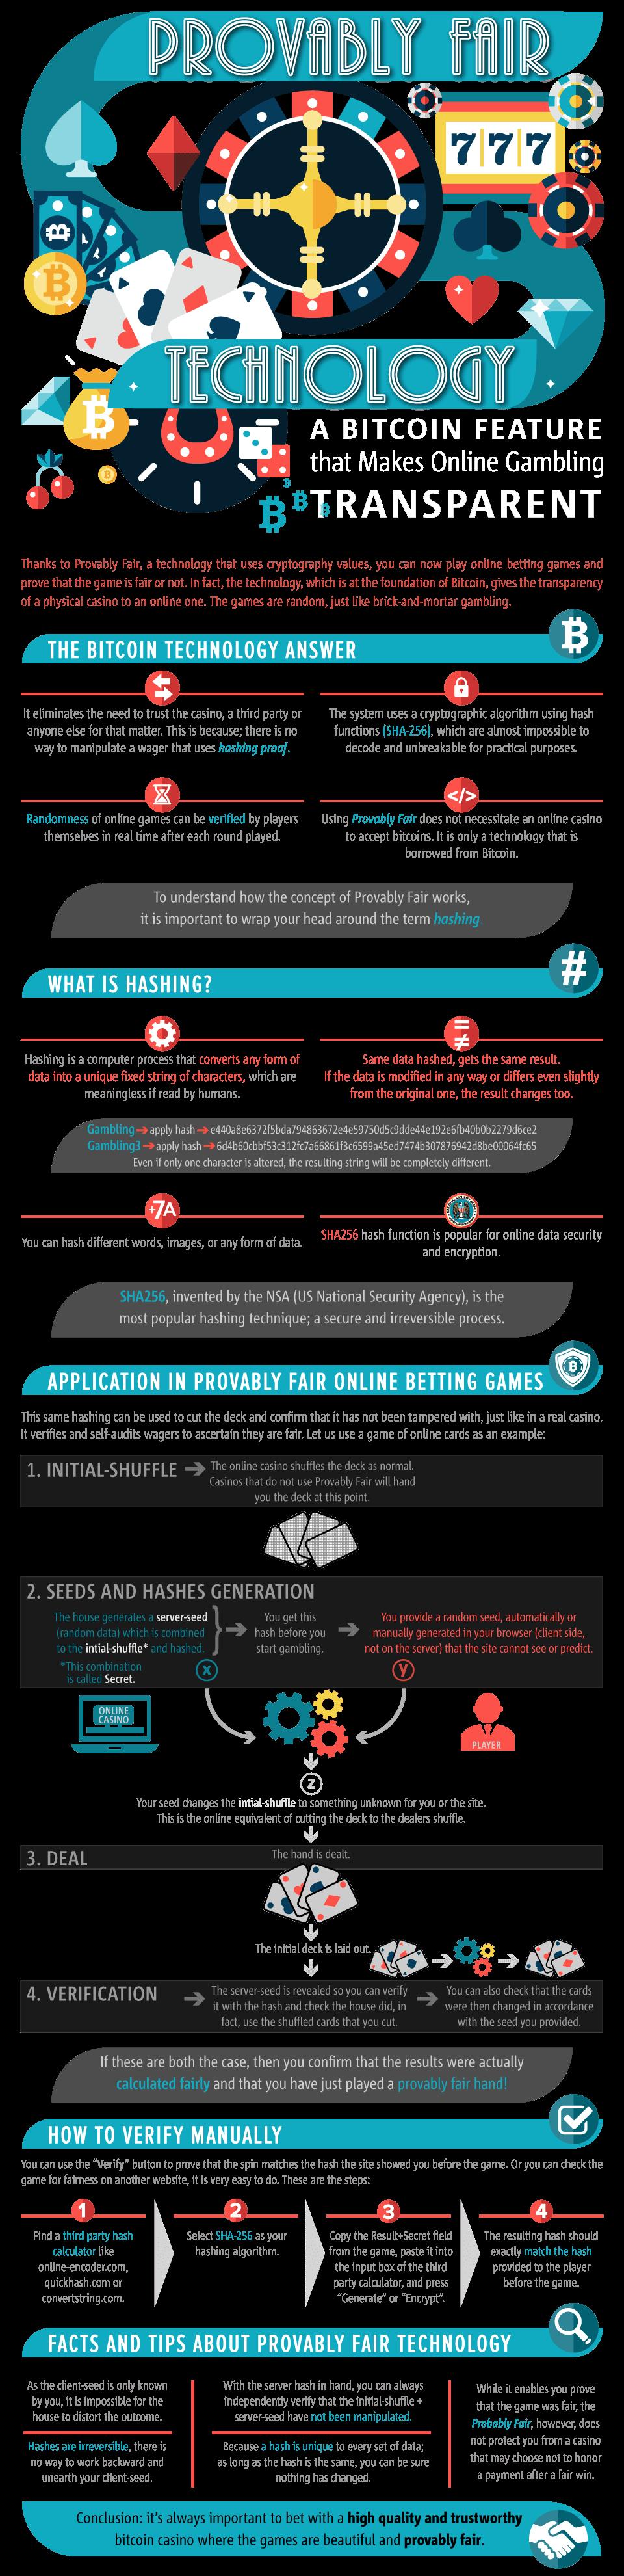 Provably Fair Top Online Bitcoin Casinos Top online